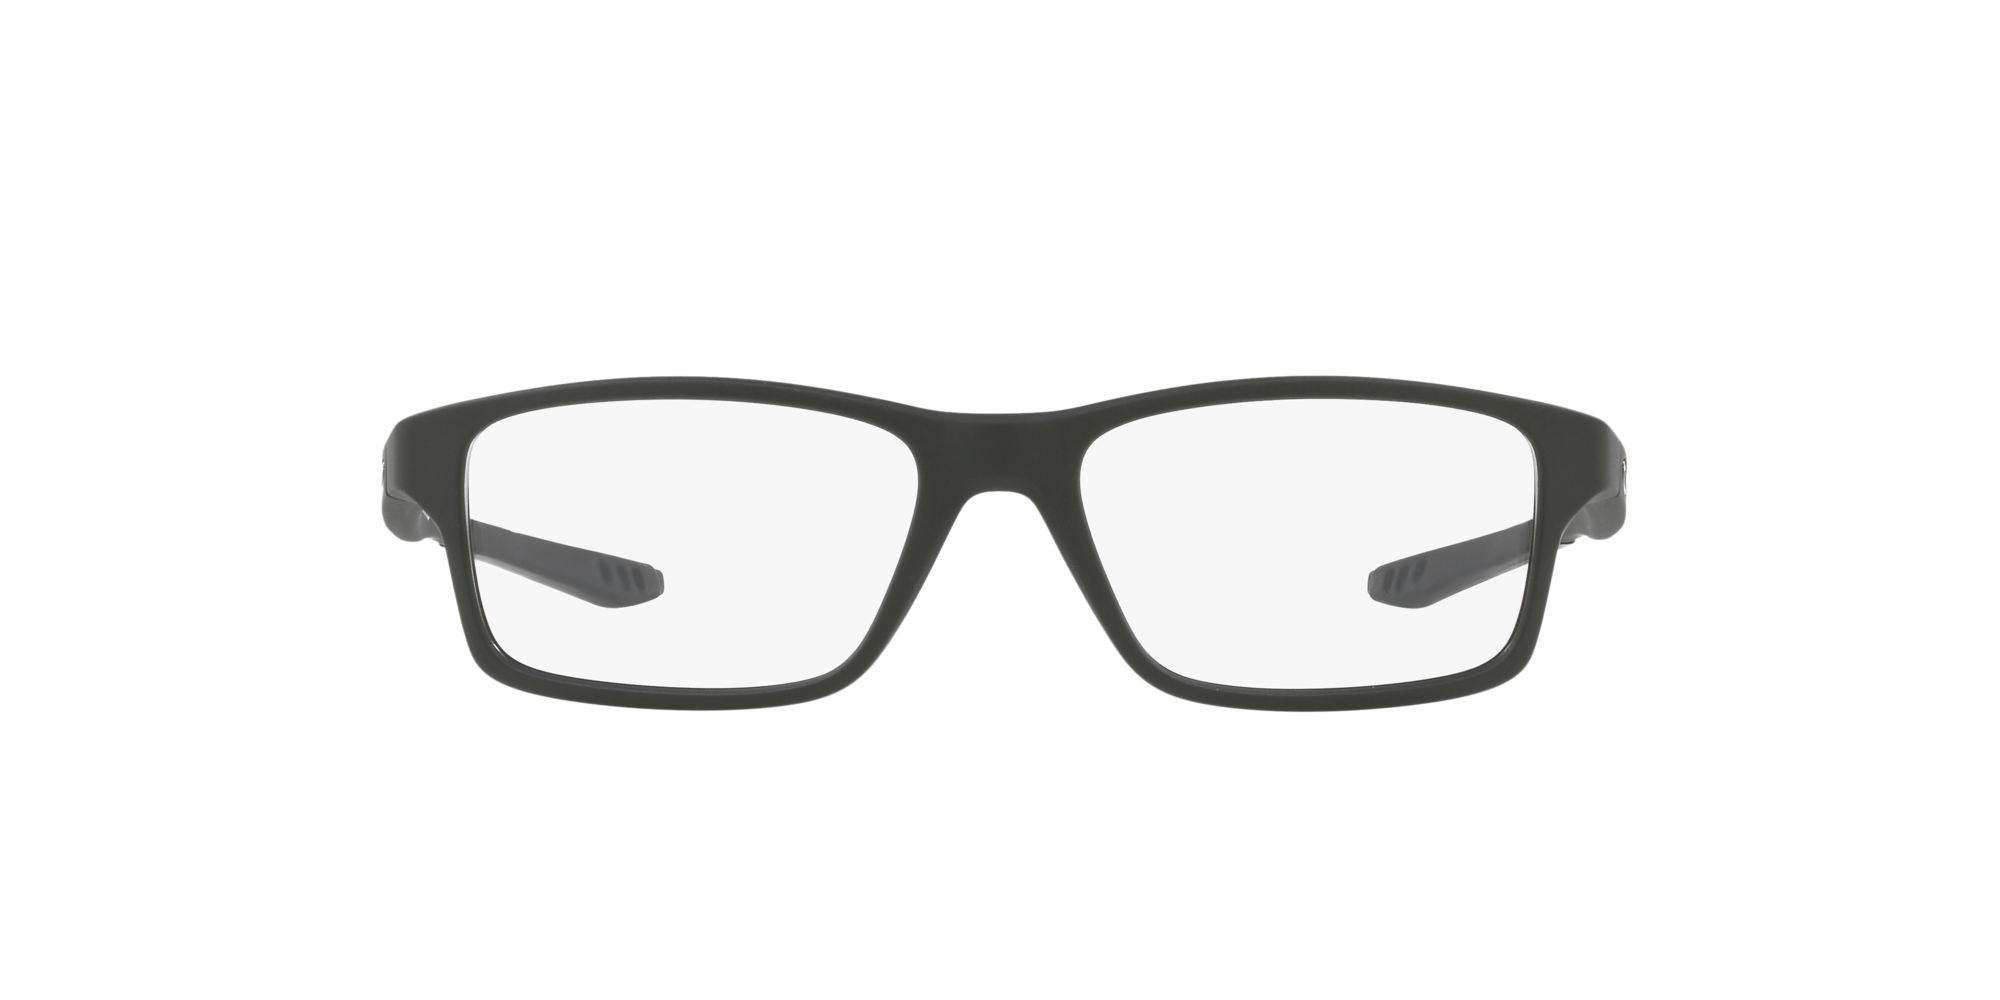 Image for OY8002 CROSSLINK XS from LensCrafters | Glasses, Prescription Glasses Online, Eyewear